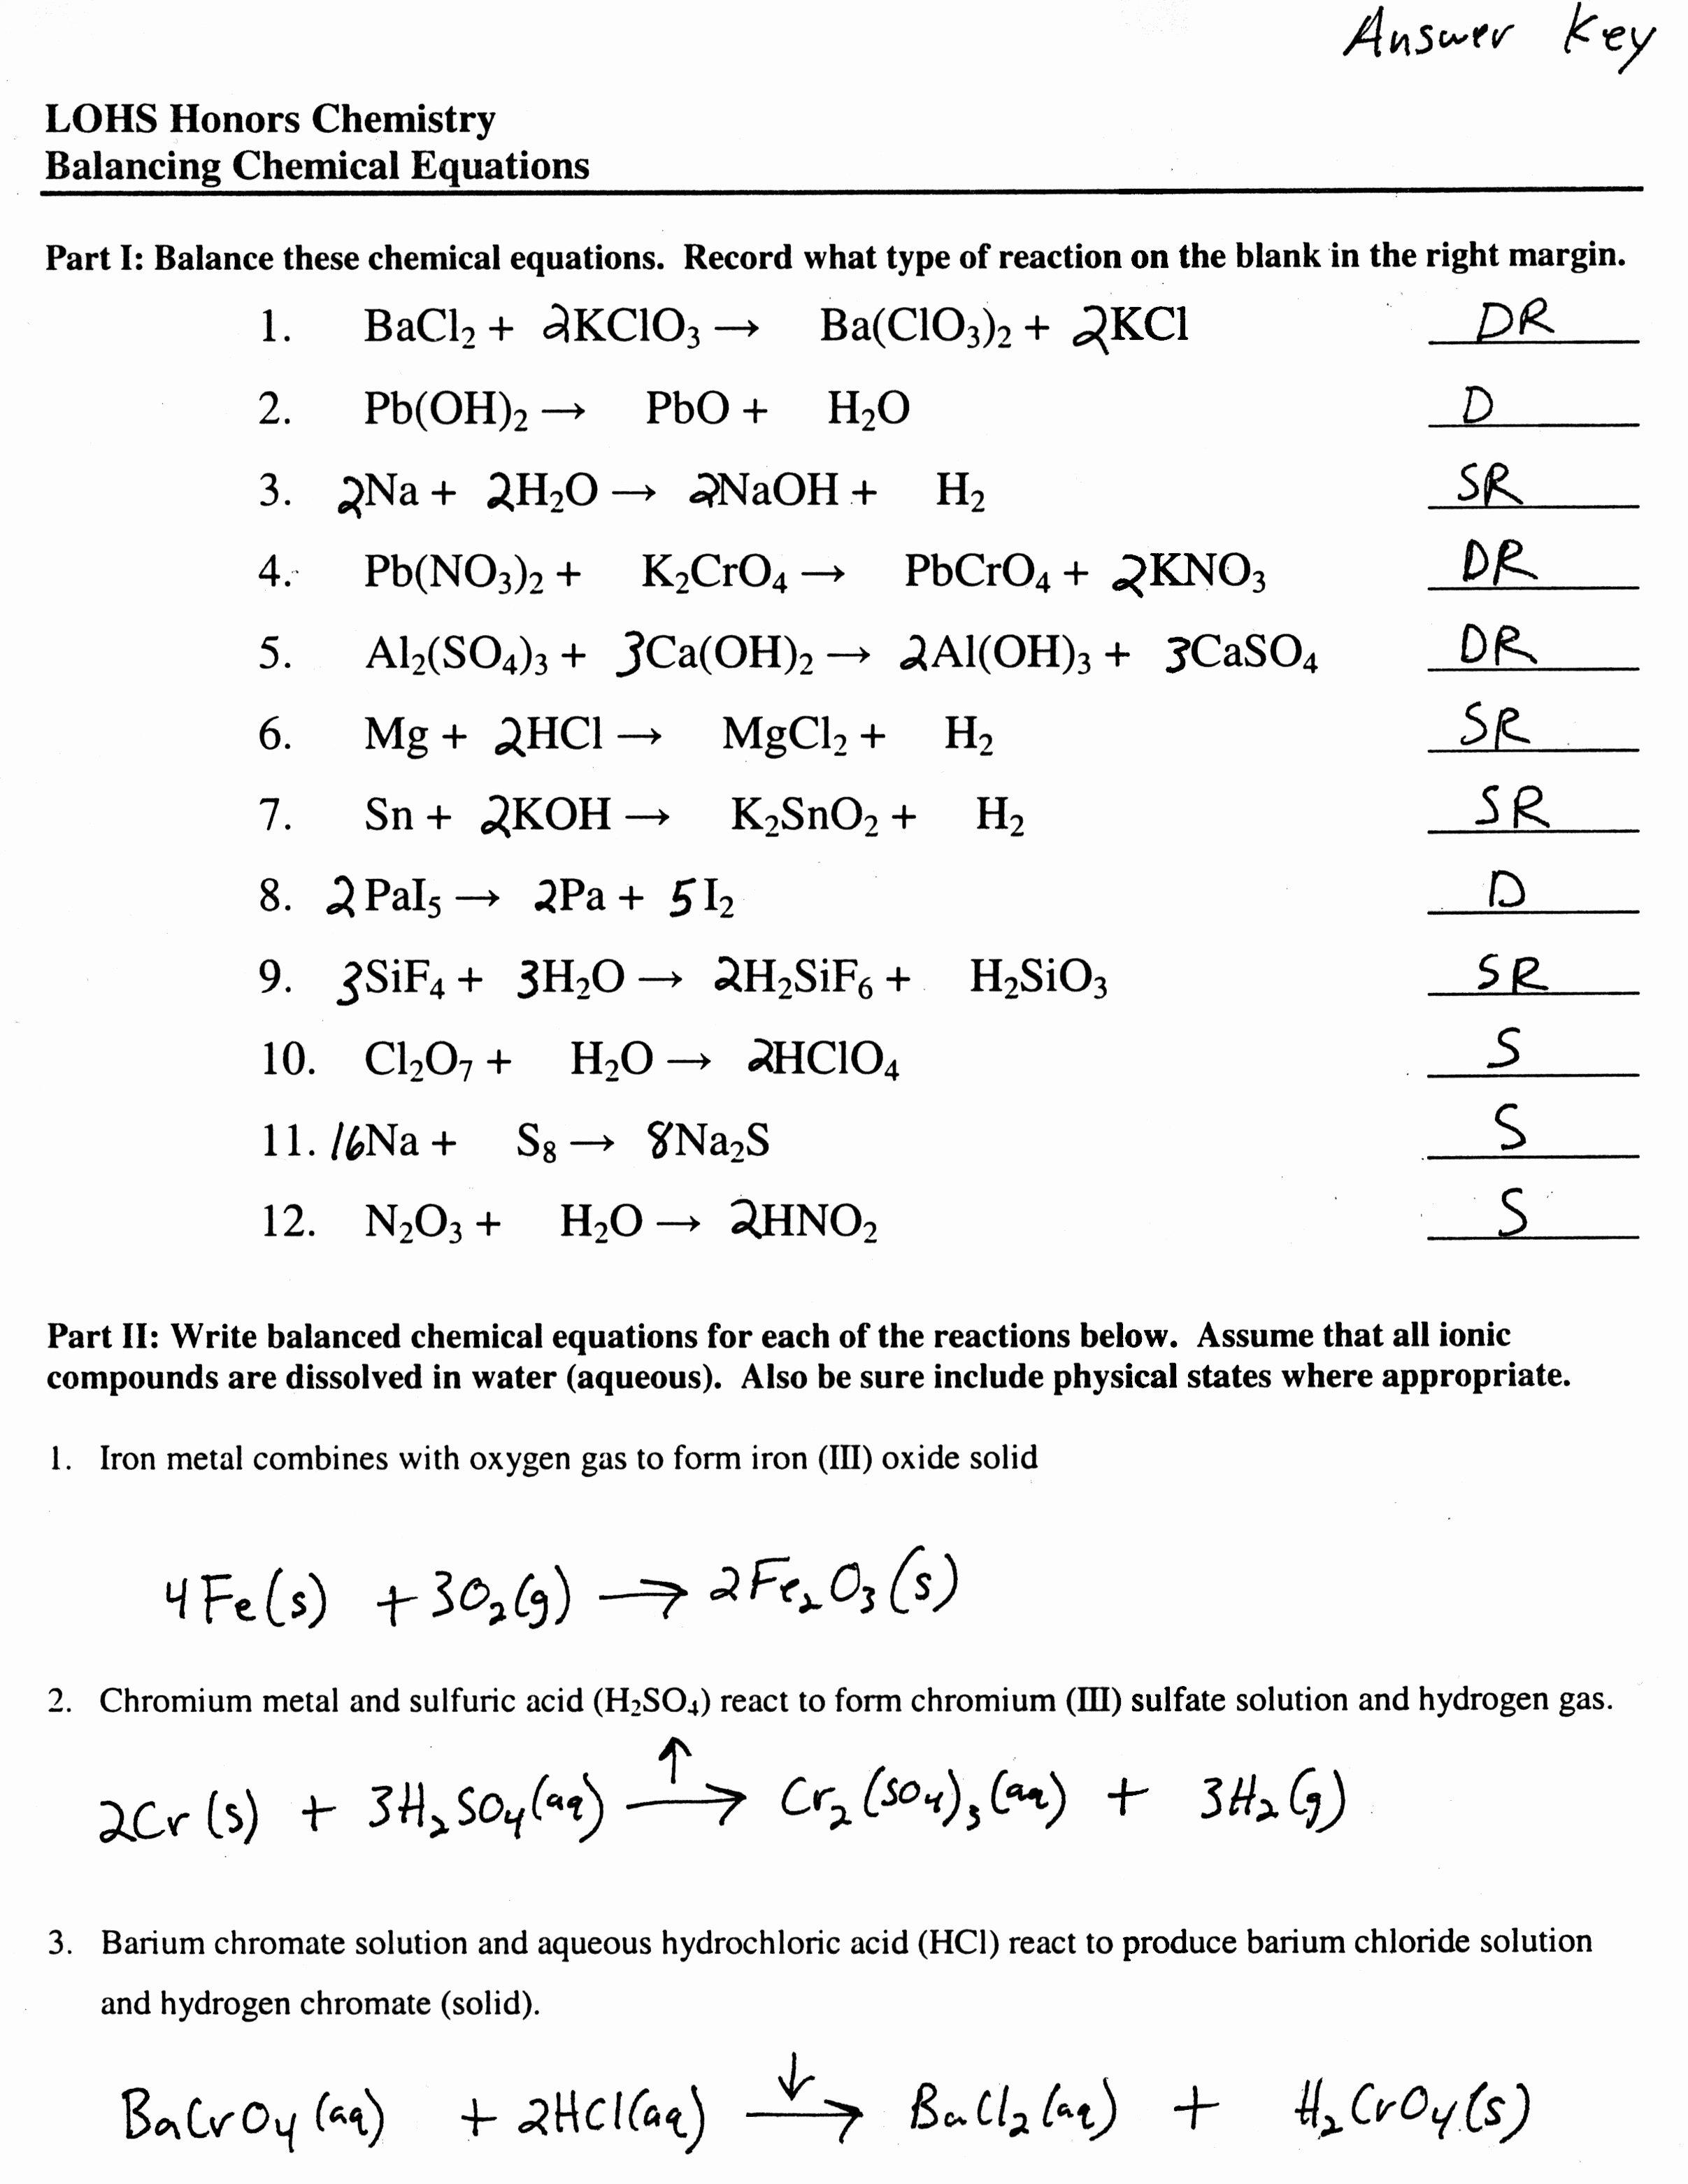 Balancing Chemical Equation Worksheet Fresh Balancing Equations Worksheet Health and Fitness Training